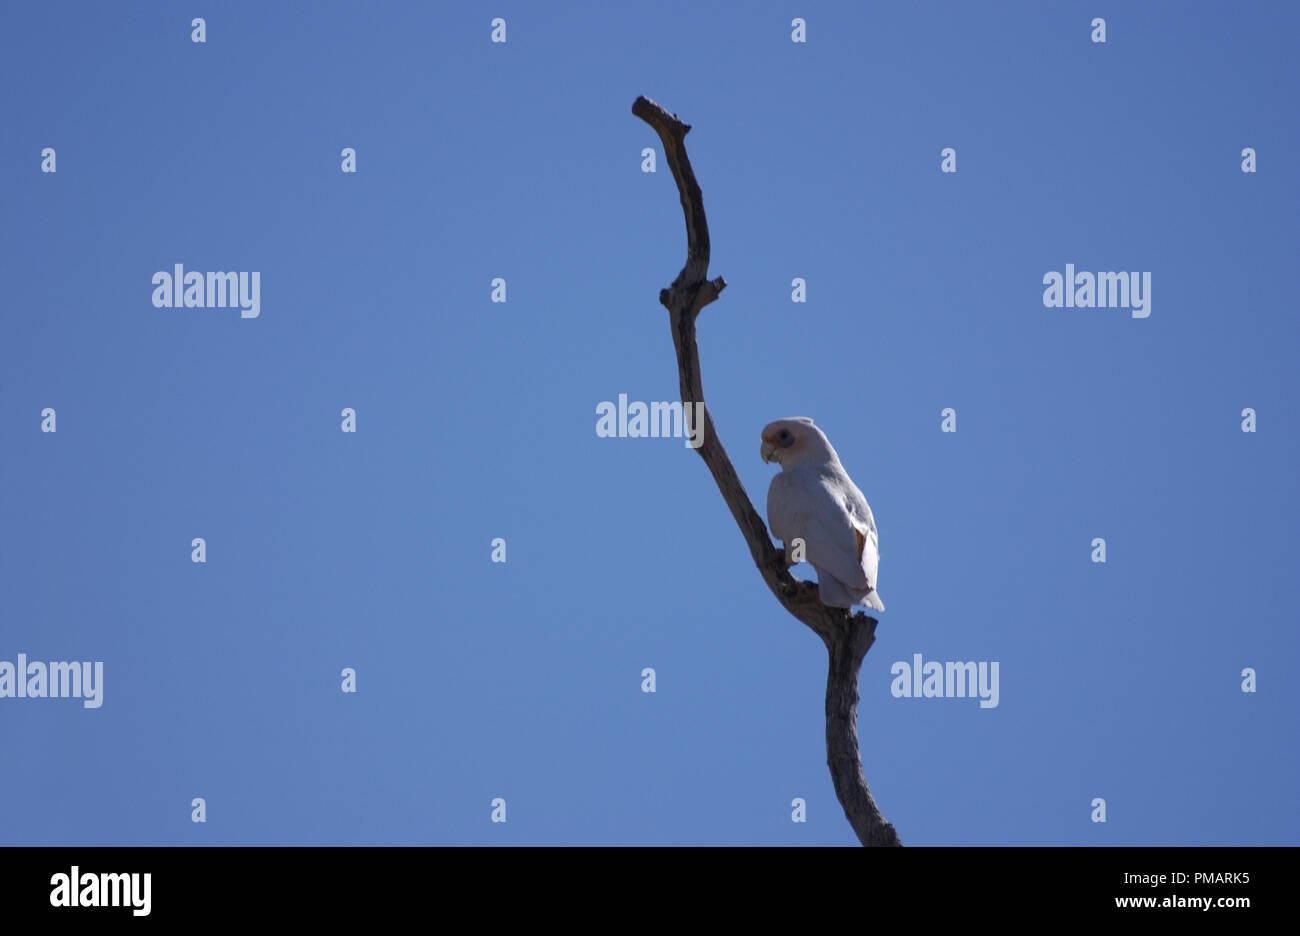 Little corella (Cacatua sanguinea) perched on tree branch in the outback of Western Australia. - Stock Image